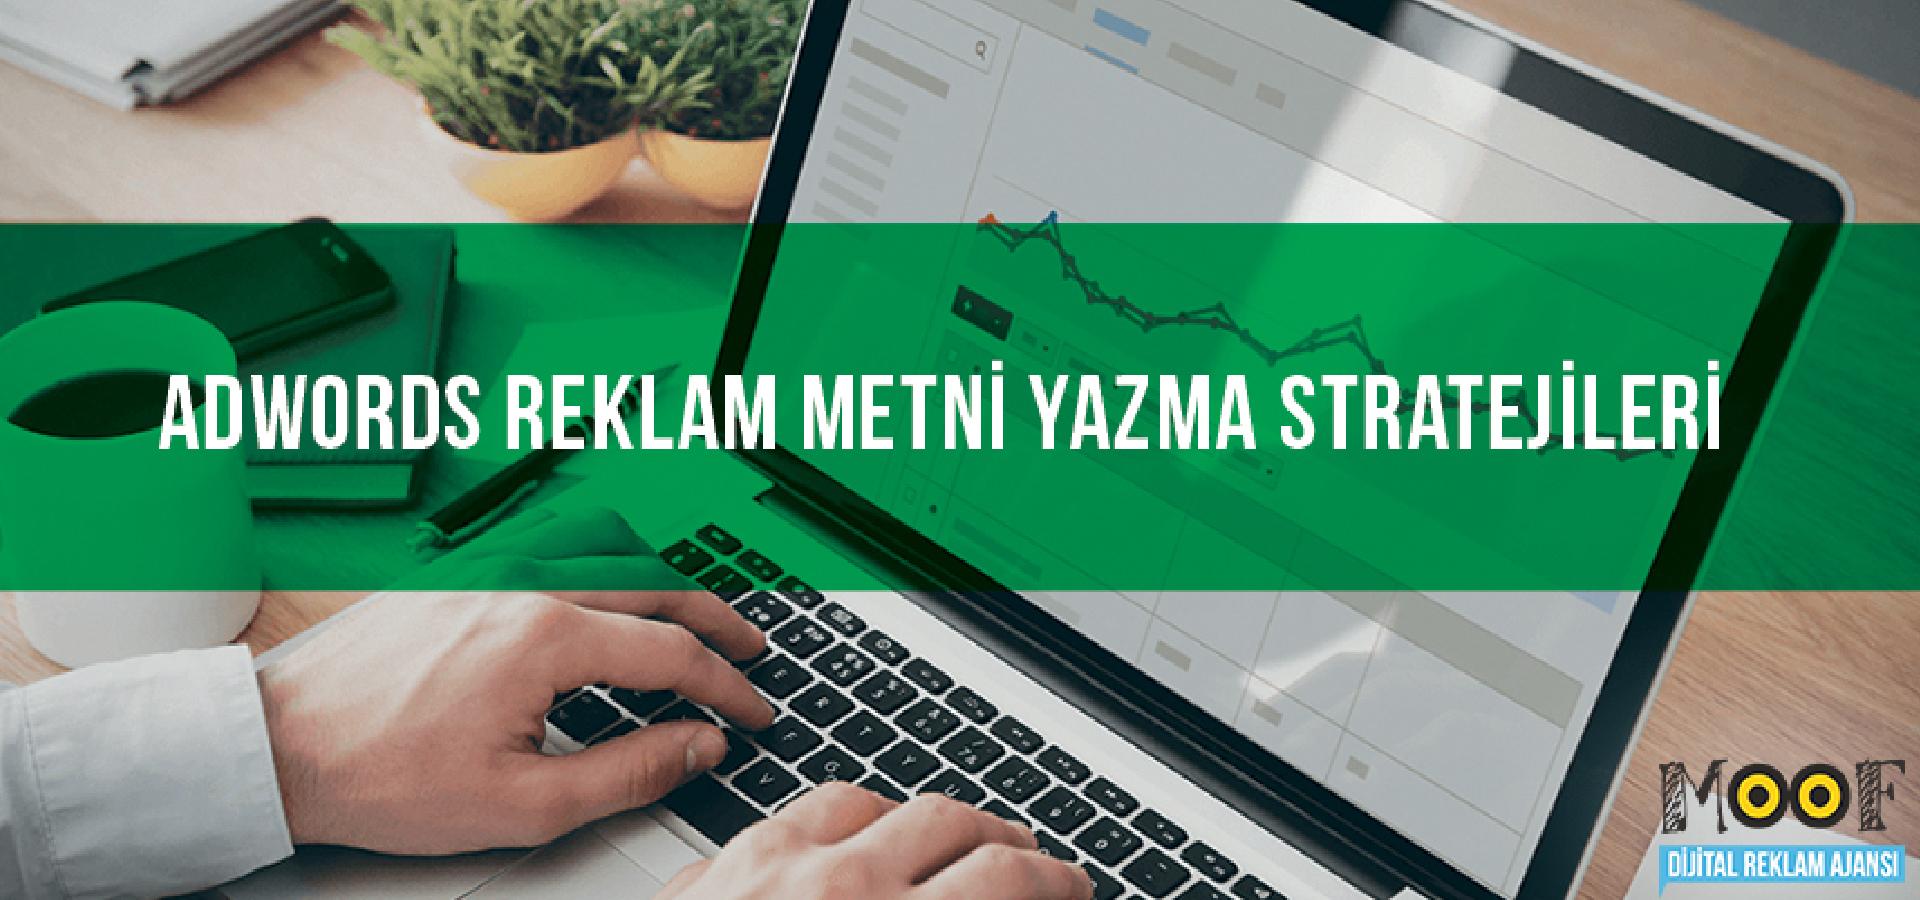 Adwords Reklam Metni Yazma Stratejileri